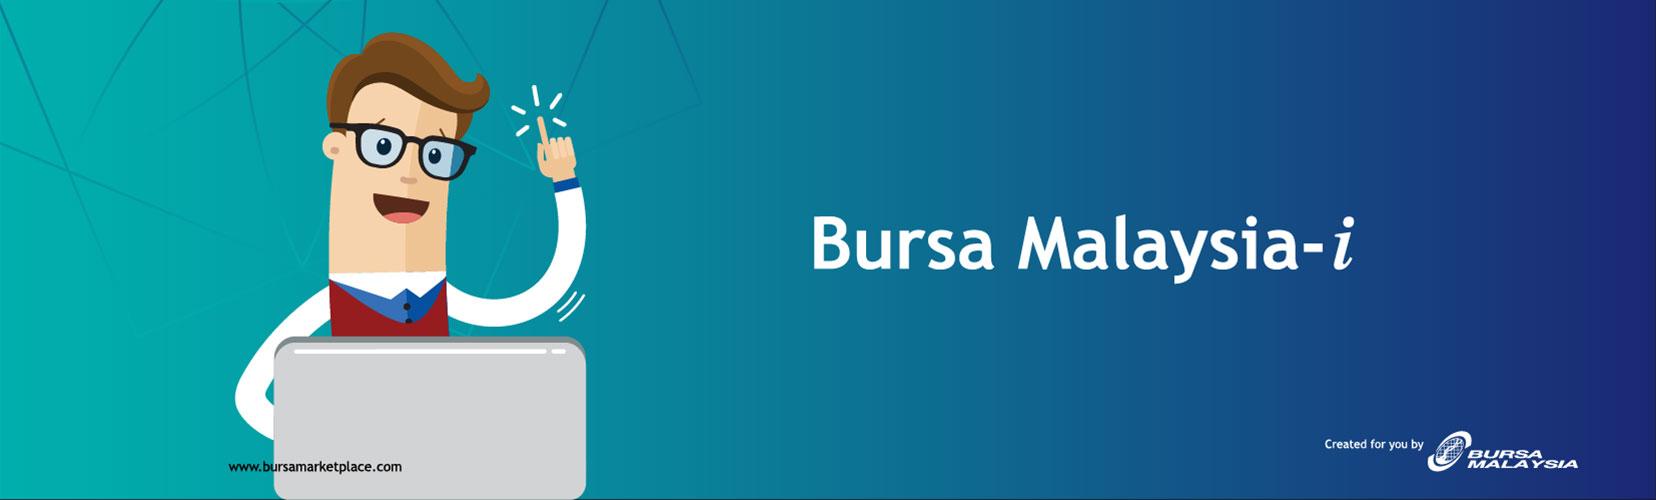 Bursa Malaysia-I Poket Risalah